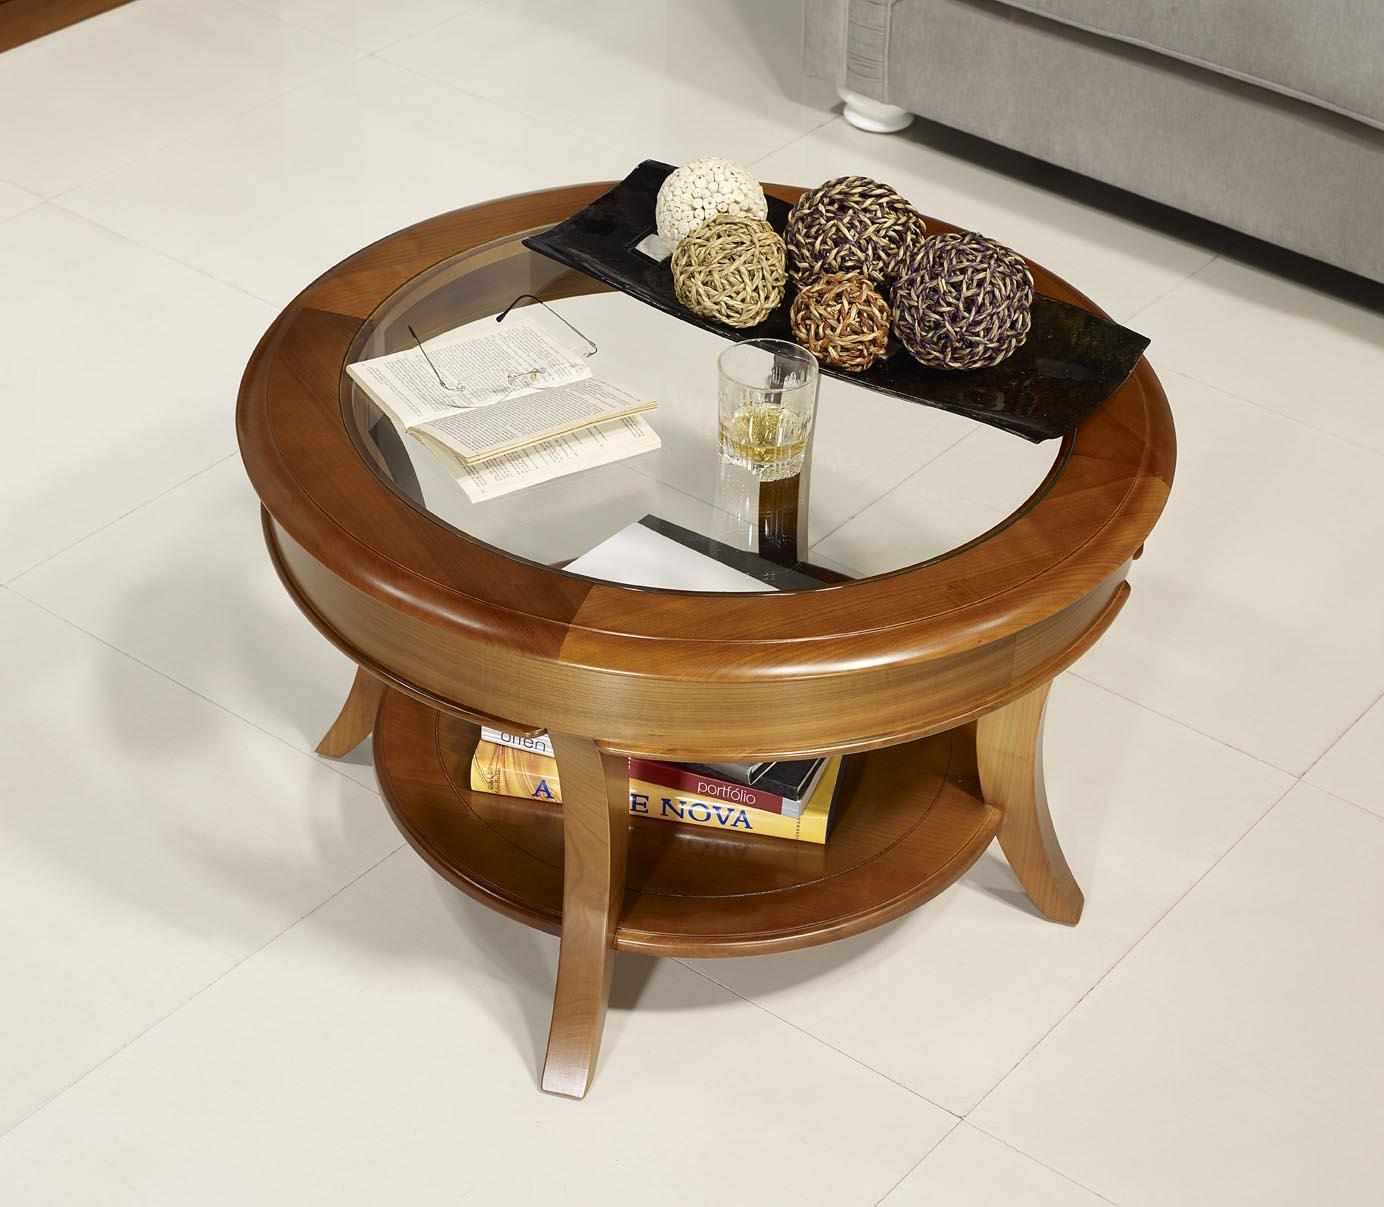 Petite table basse ronde bois brut